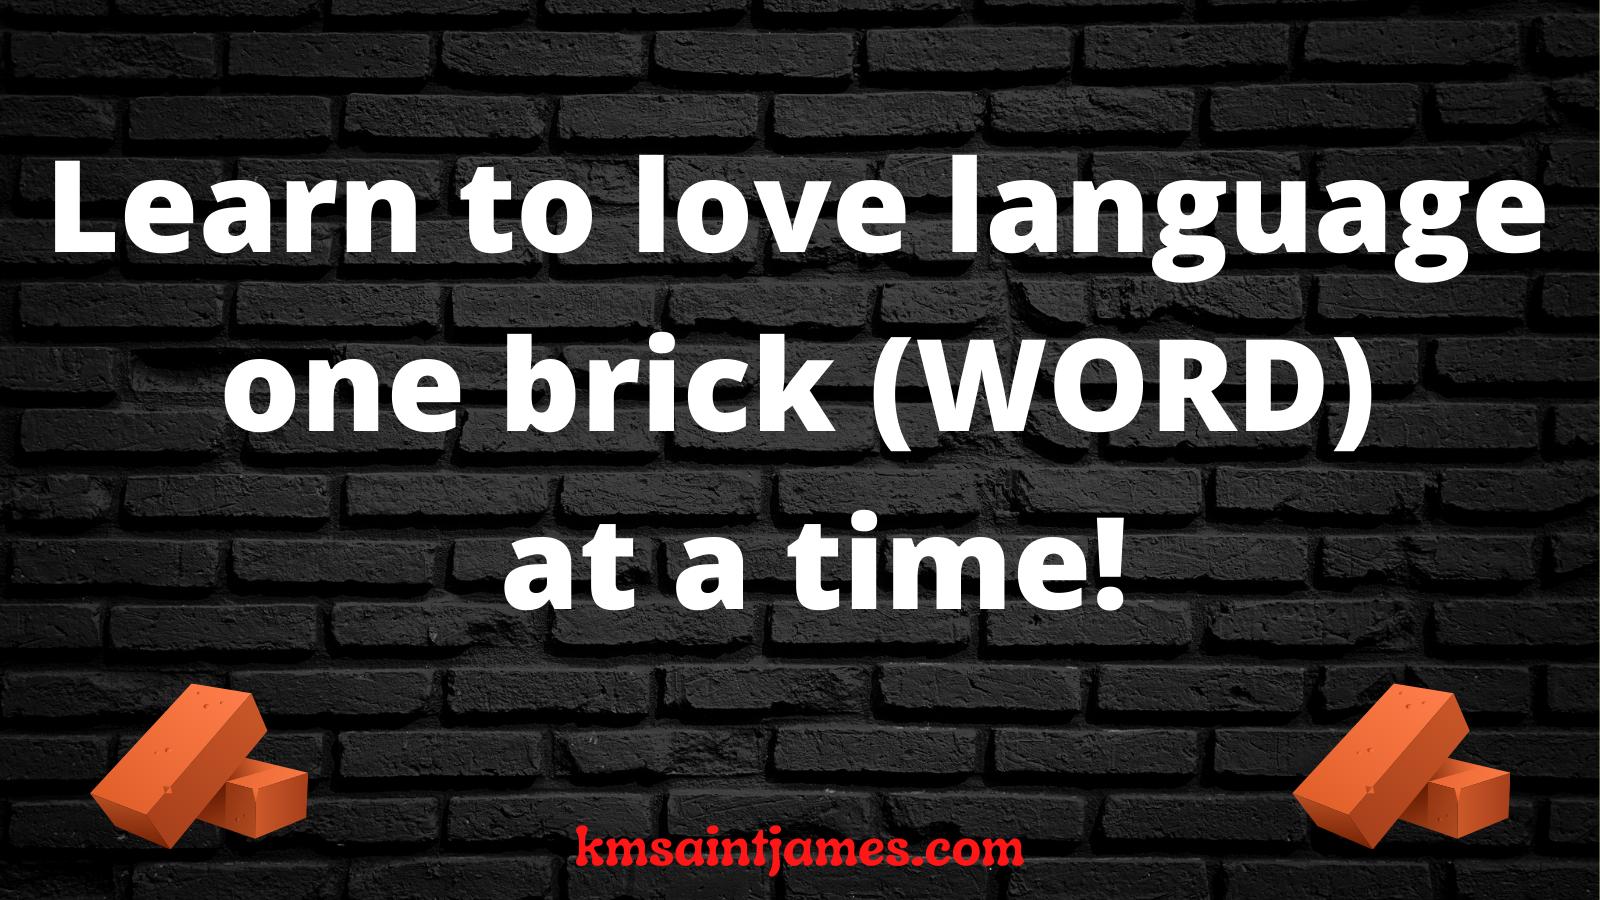 learn to love language